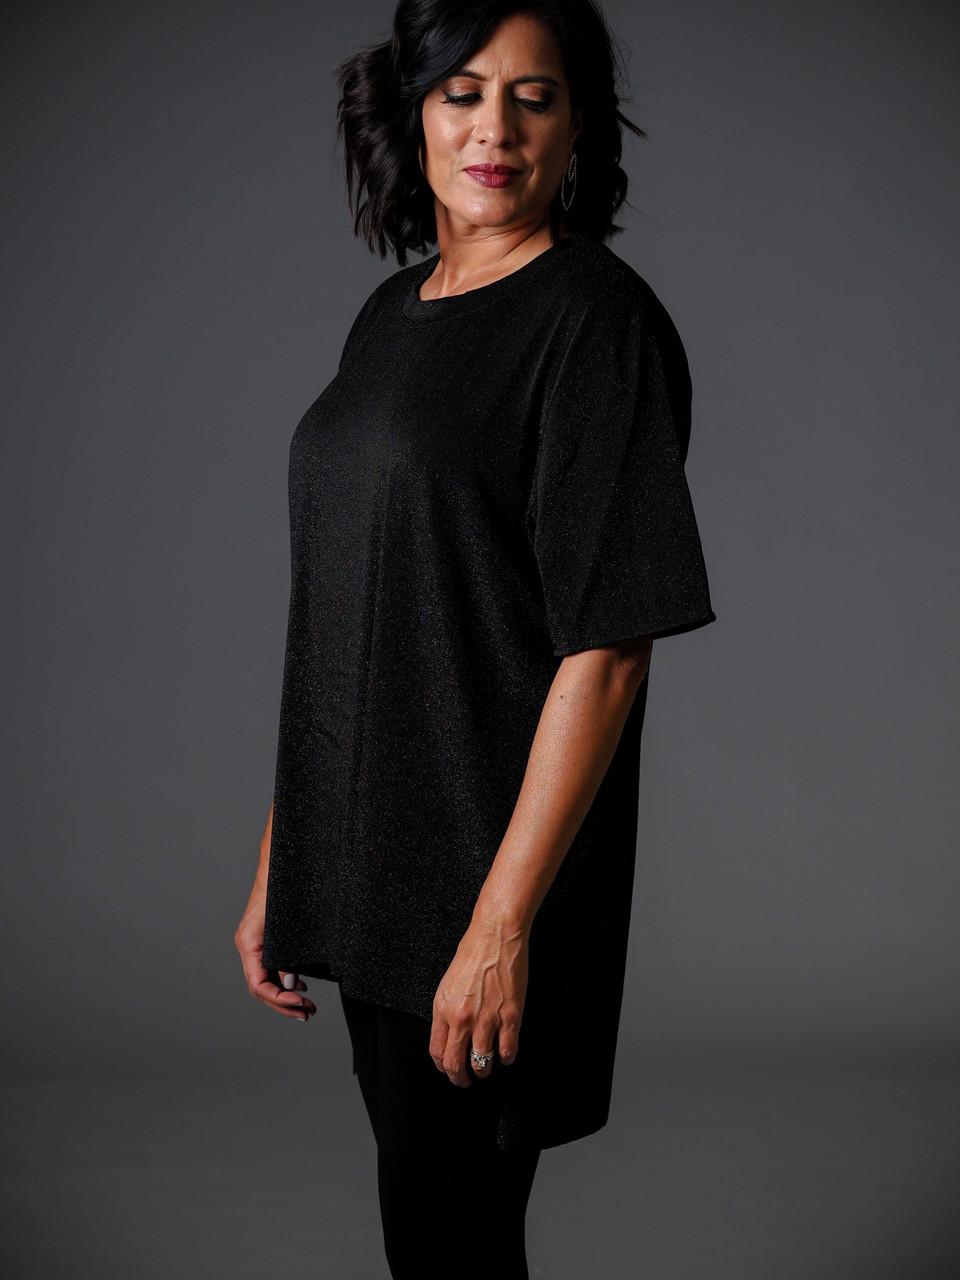 shimmered metallic black high low tunic